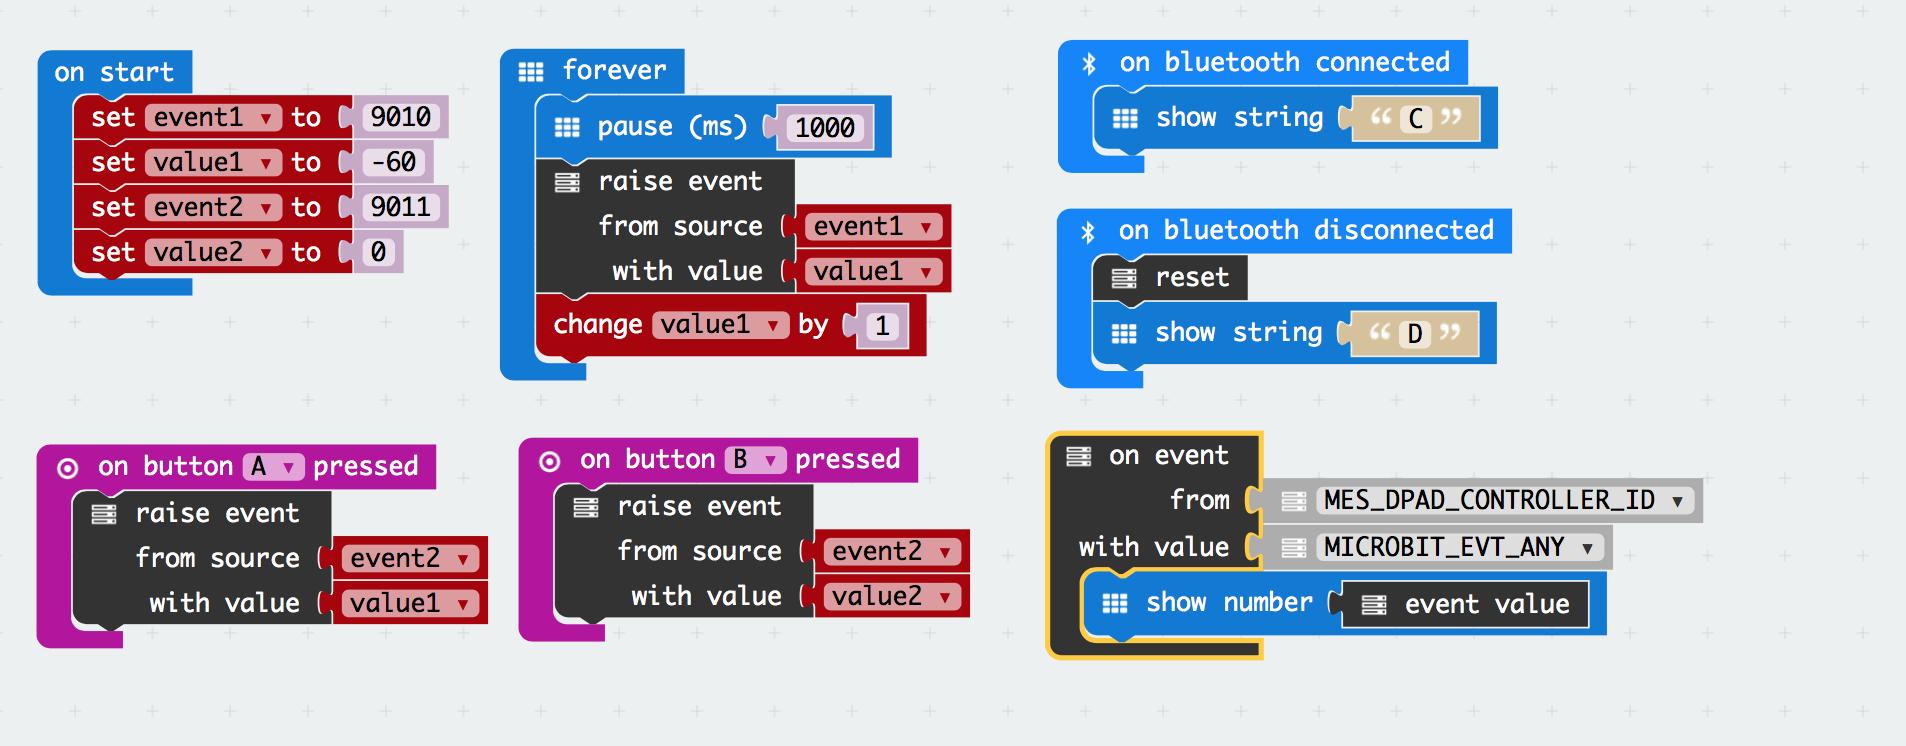 Micro:bit Swift Bluetooth LE